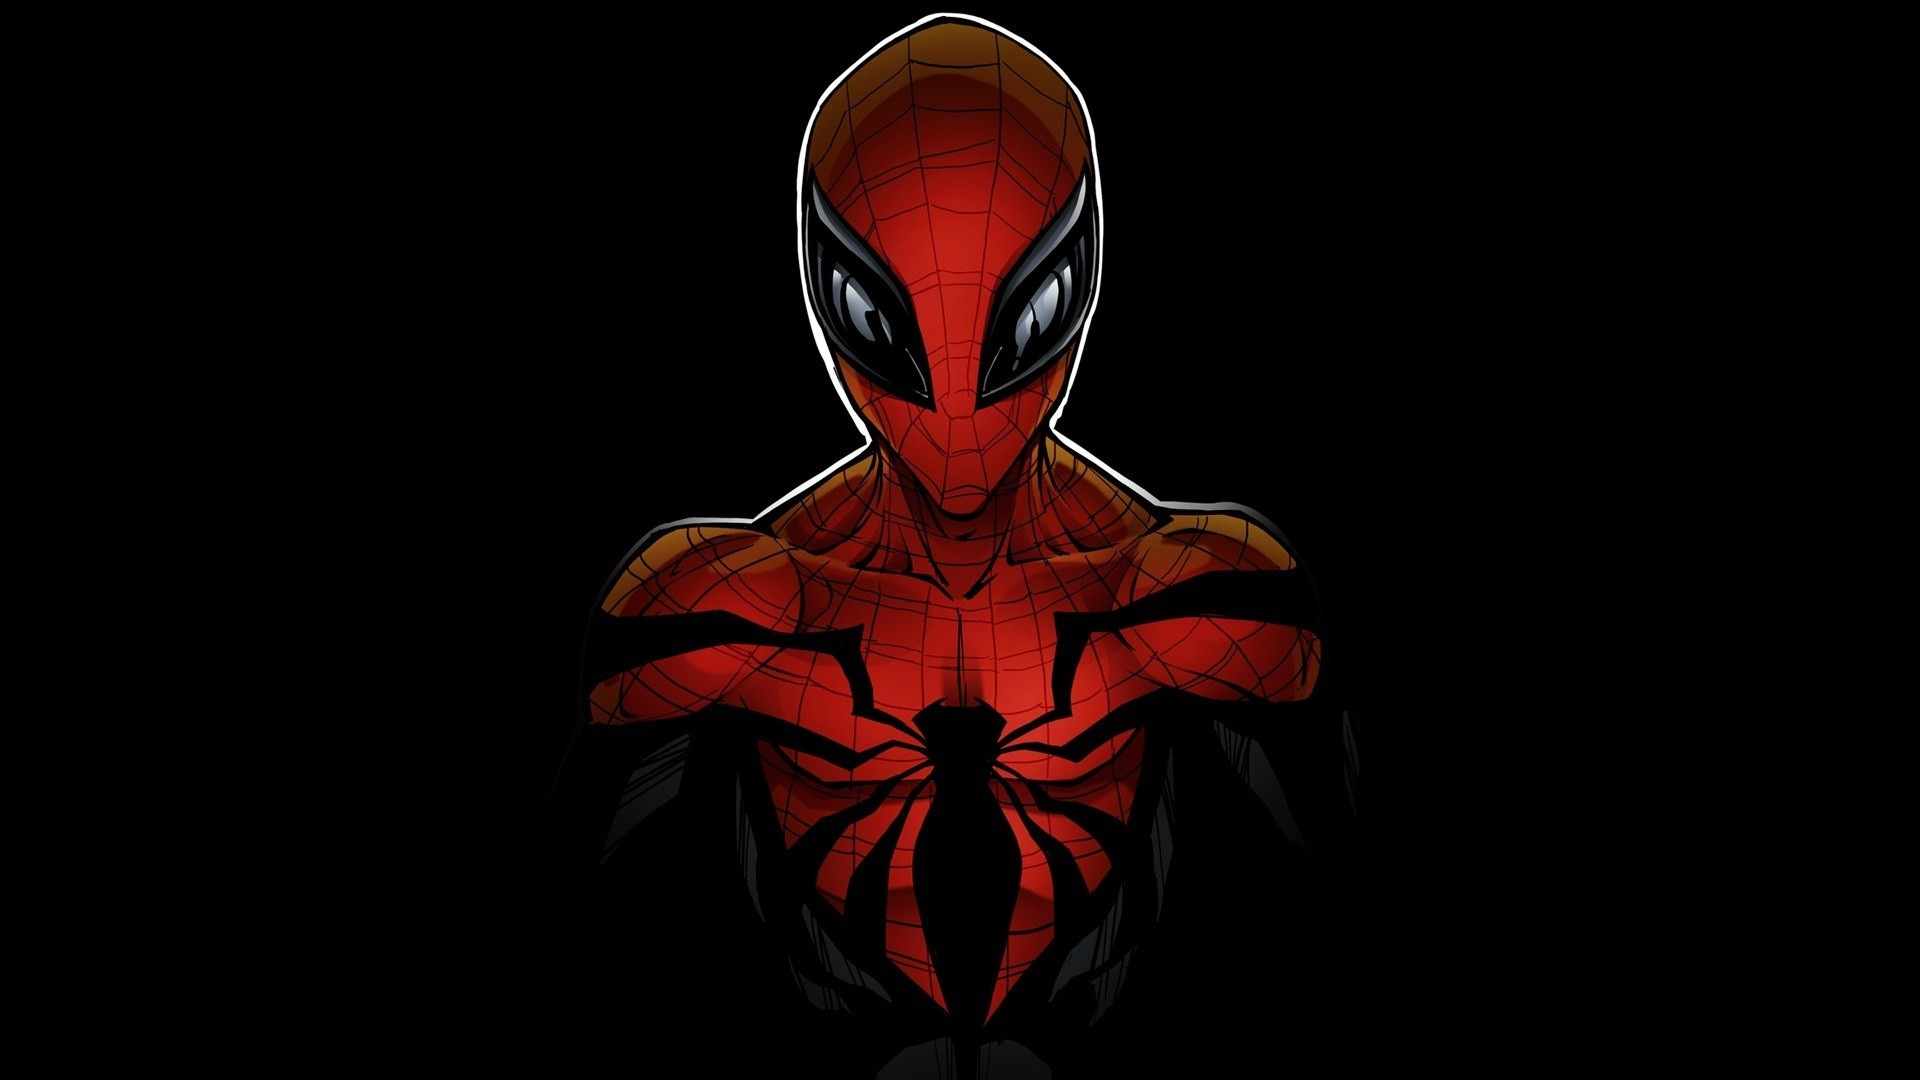 black spiderman hd wallpaper download best hd wallpaper